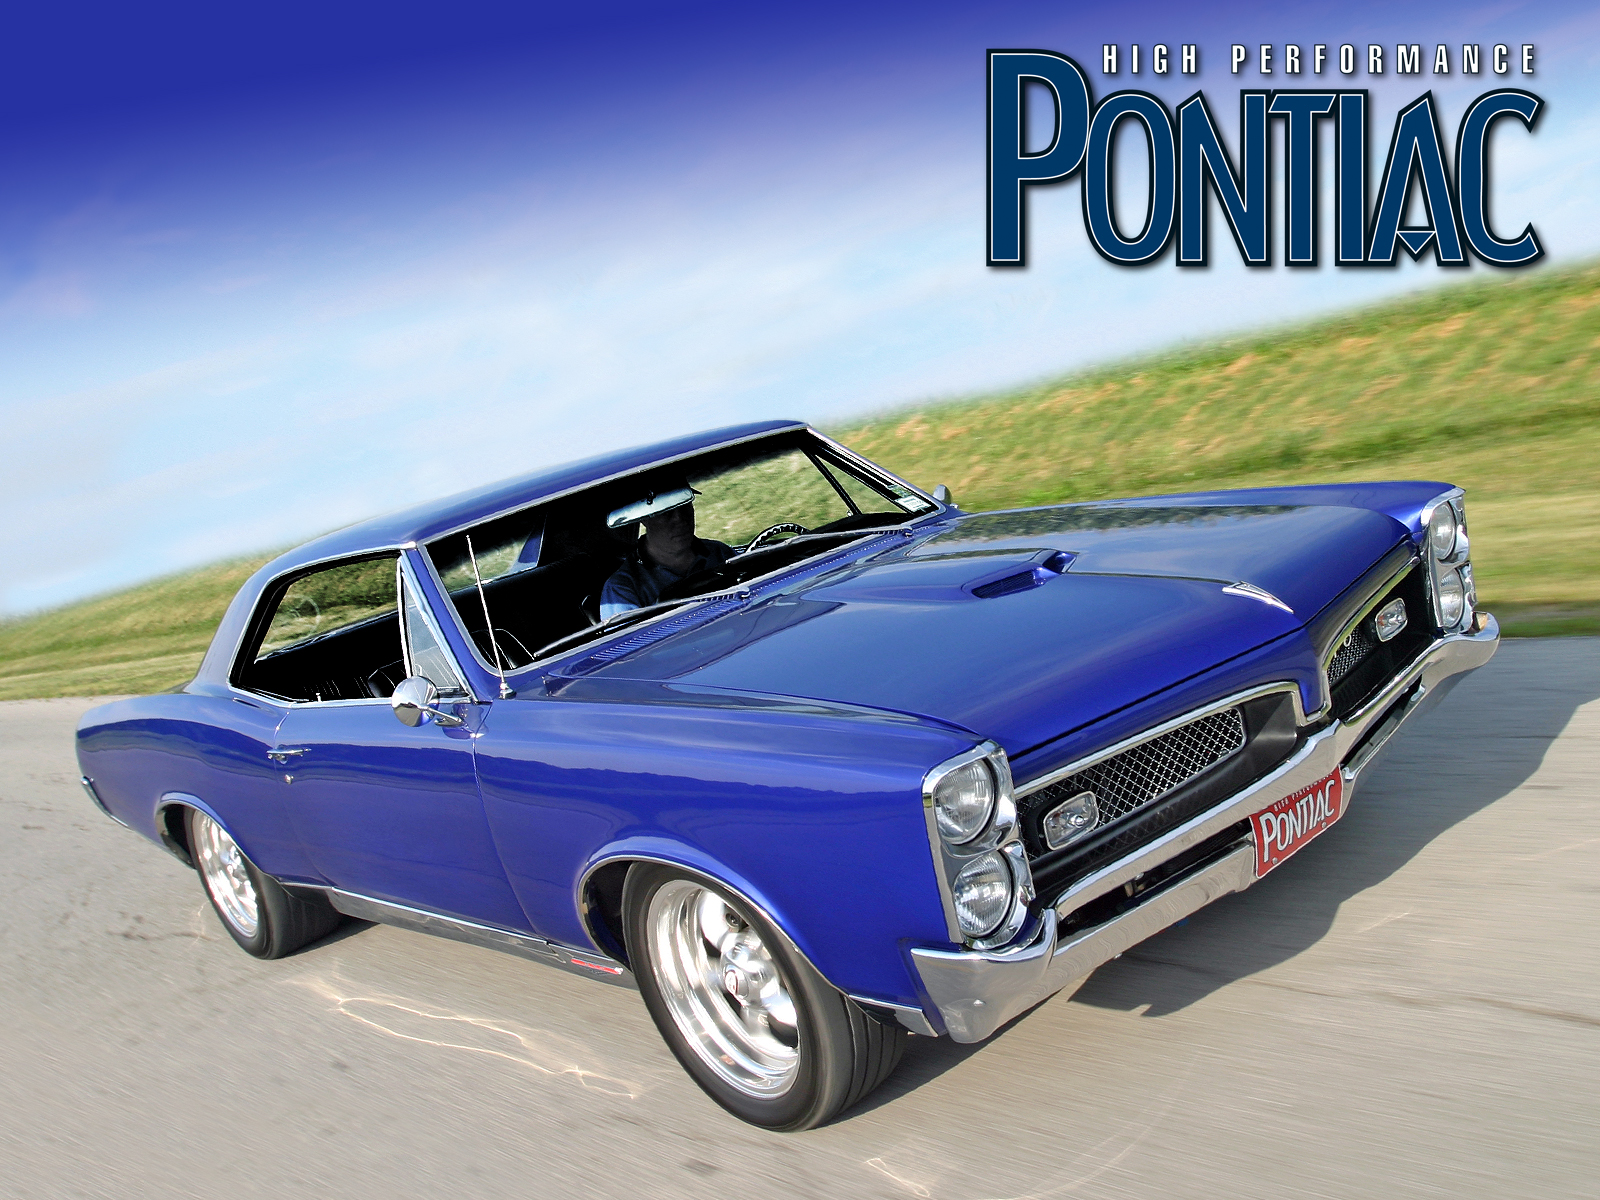 hppp 0704 1967 pontiac gto 1600x1200jpg windowscenternl 1600x1200